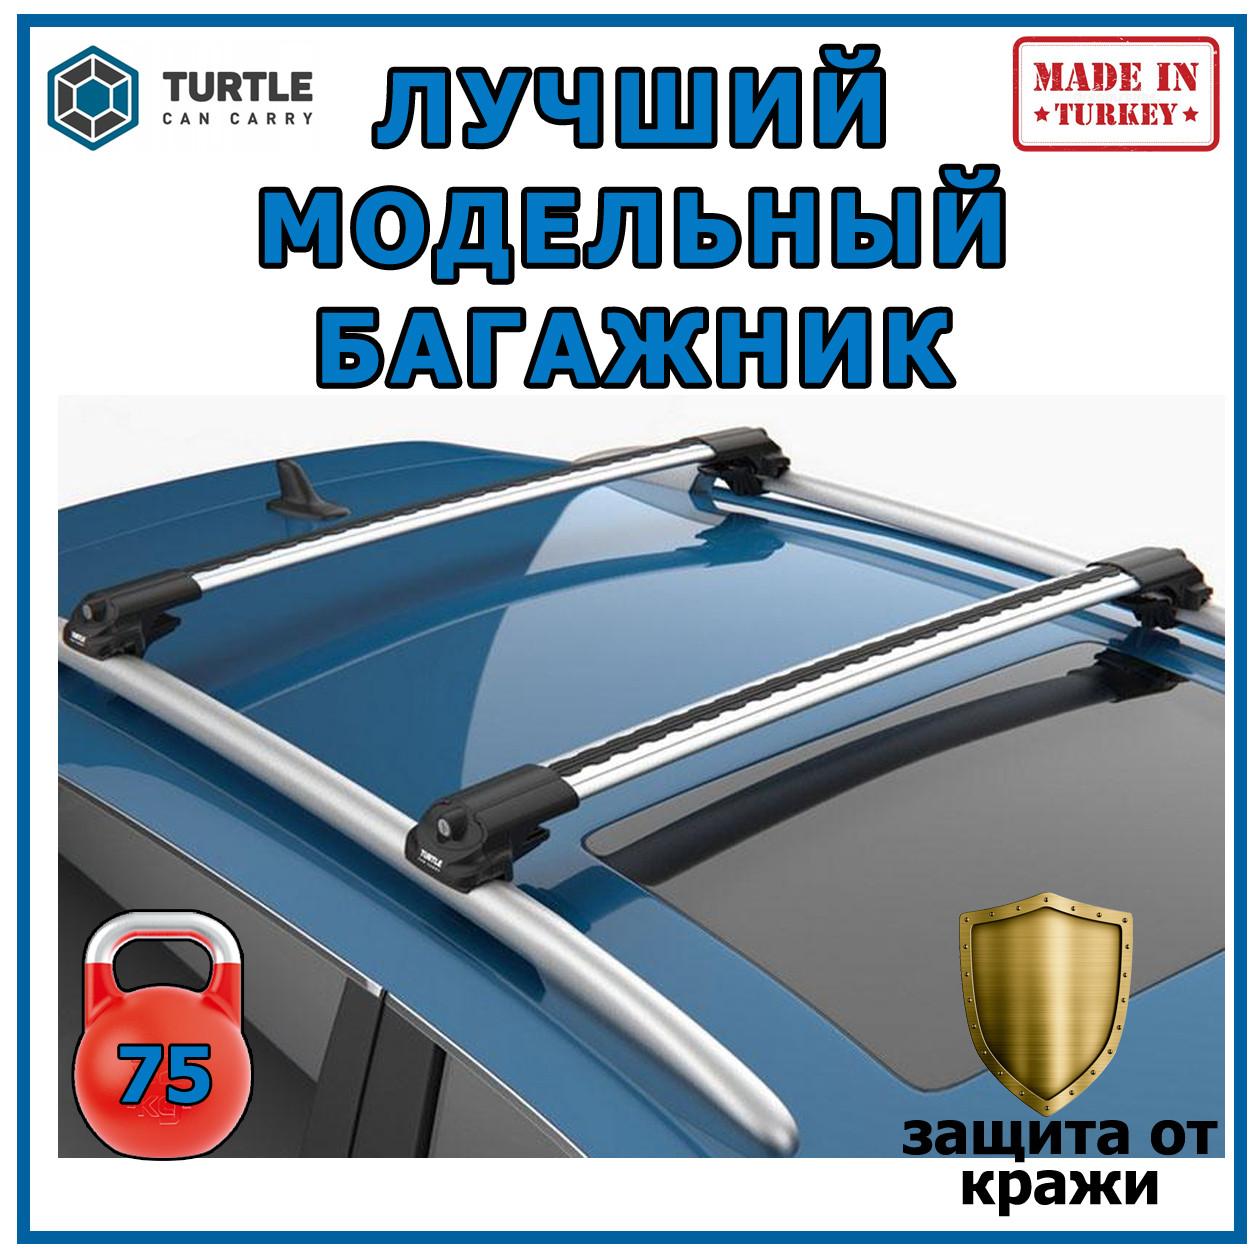 Багажник на крышу Honda Civic 1995-2002 на рейлинги серый Turtle